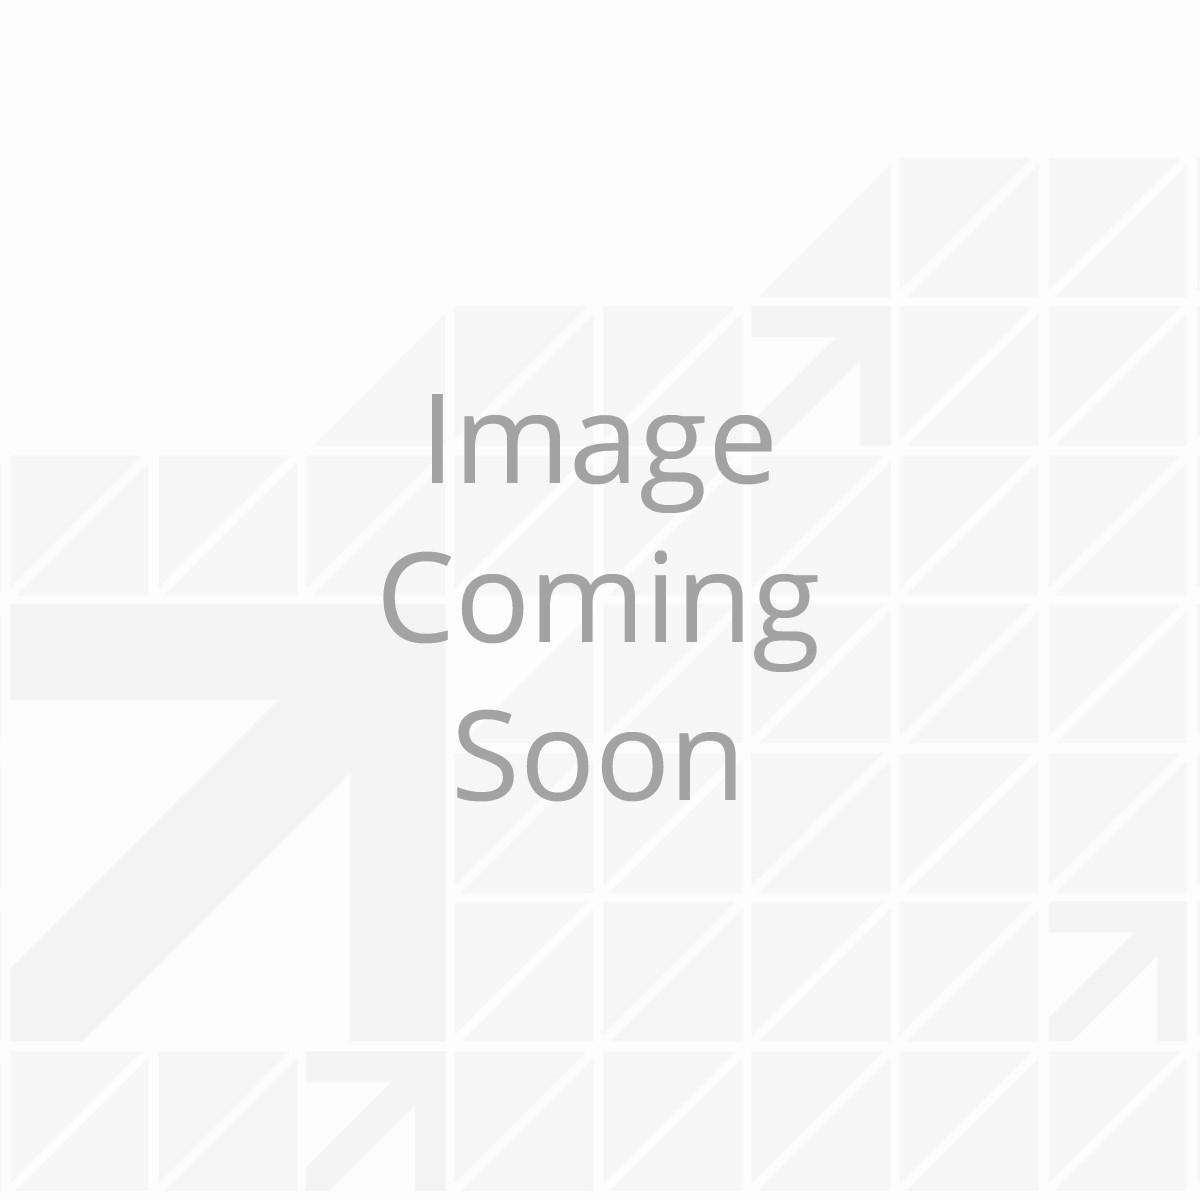 50A 125/250V Male Locking Plug - Black